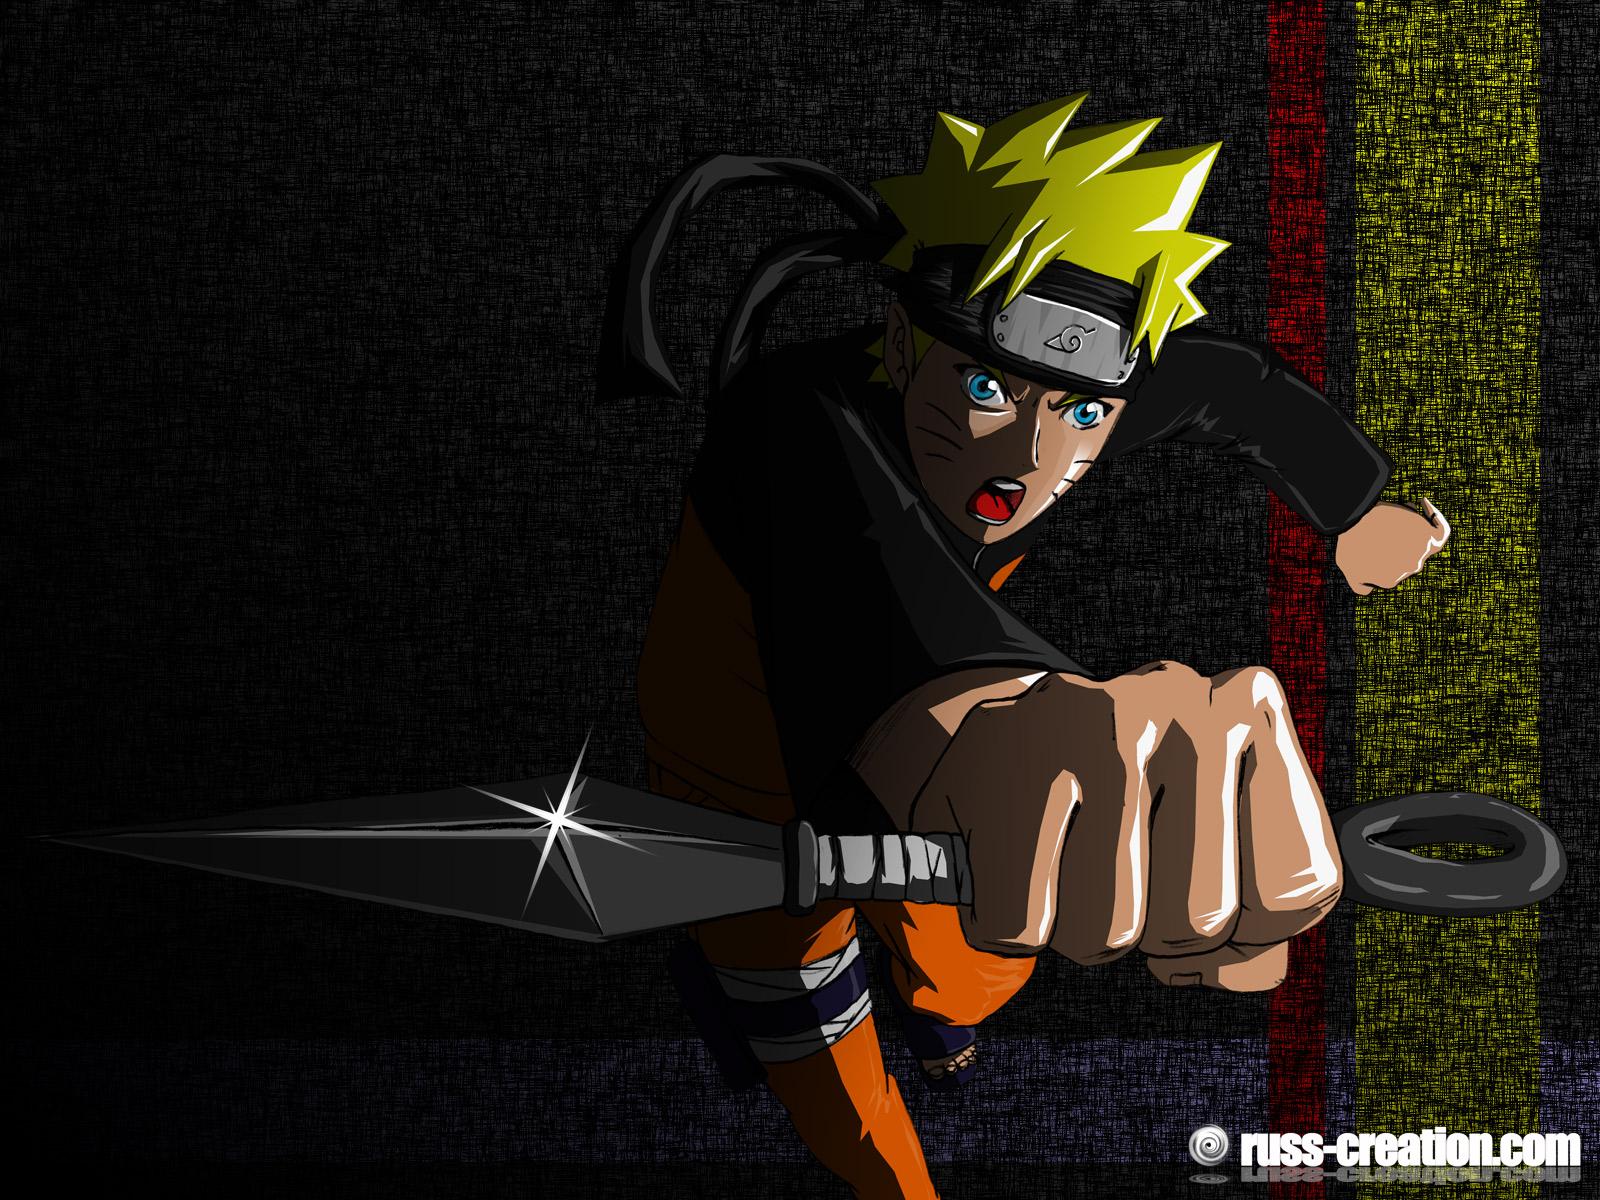 Wallpapers de Naruto Shippuden One Piece Bleach 1600x1200